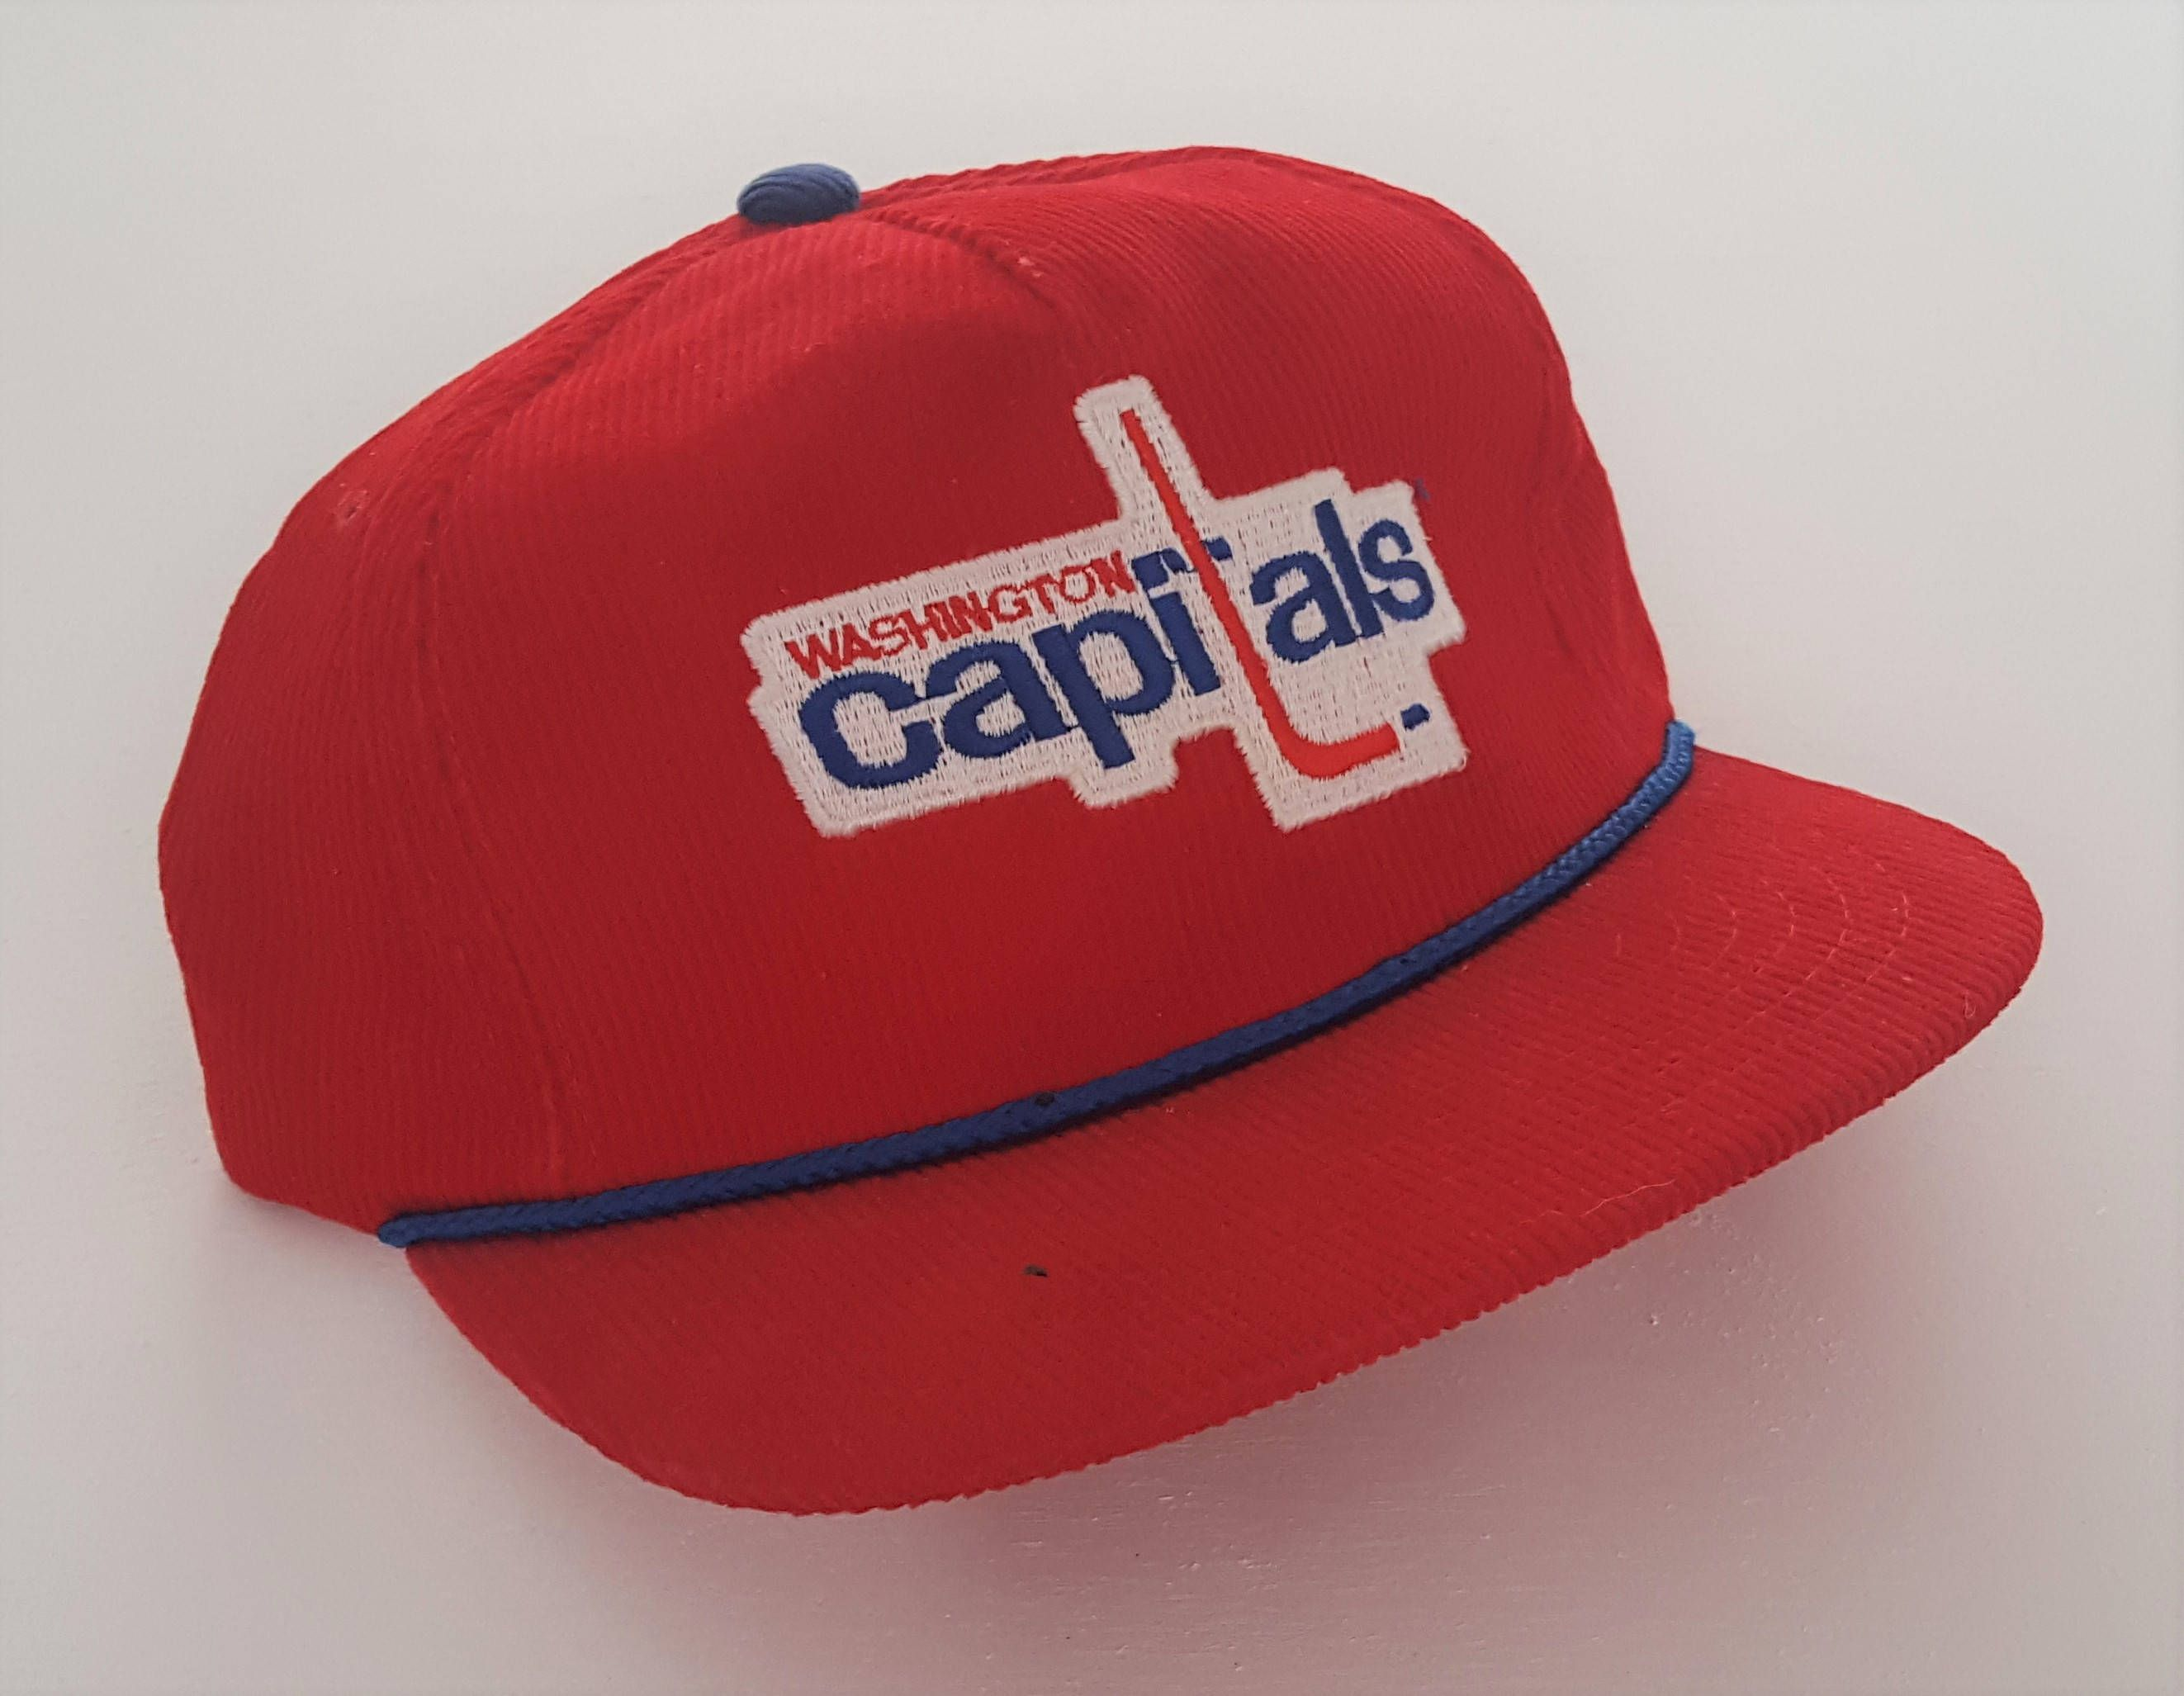 c2480052 ... official store vintage washington capitals ted fletcher snapback hat  nhl vtg by streetwearandvintage on etsy d9e98 ...